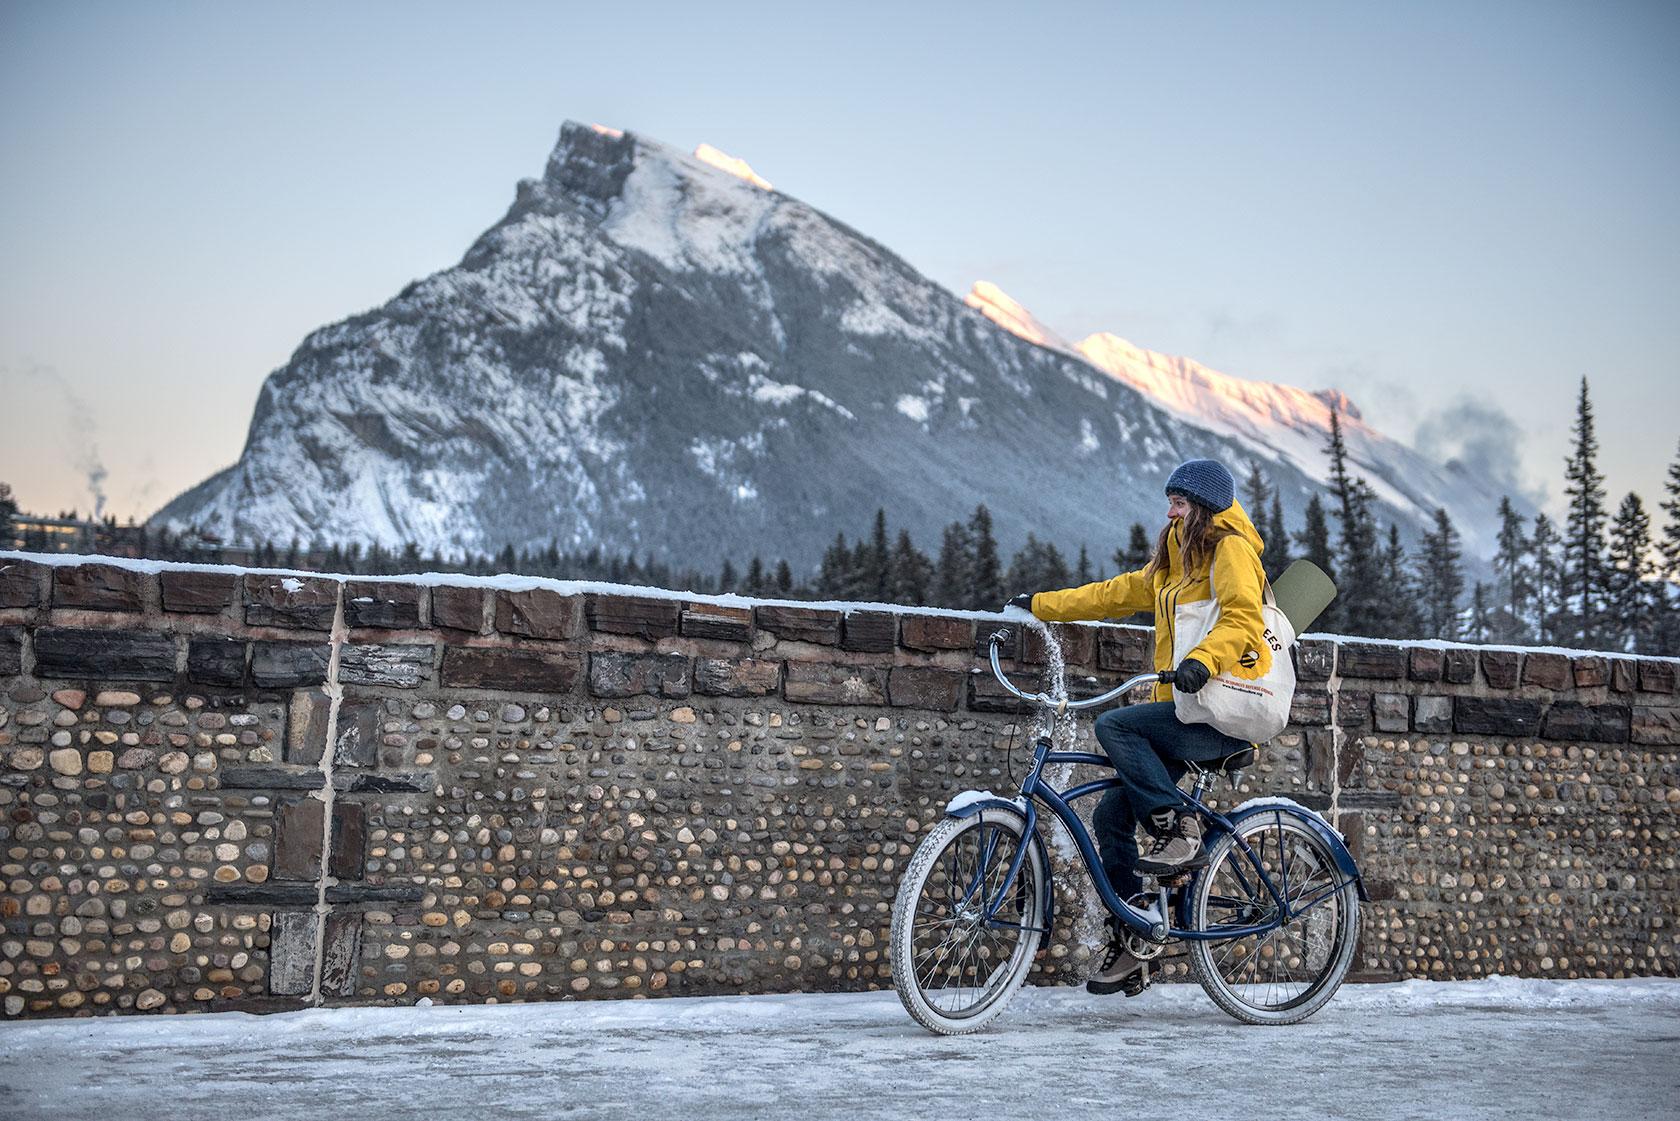 austin-trigg-patagonia-banff-alberta-winter-bicylce-ride-mt-rundle-bridge-snow-lifestyle.jpg